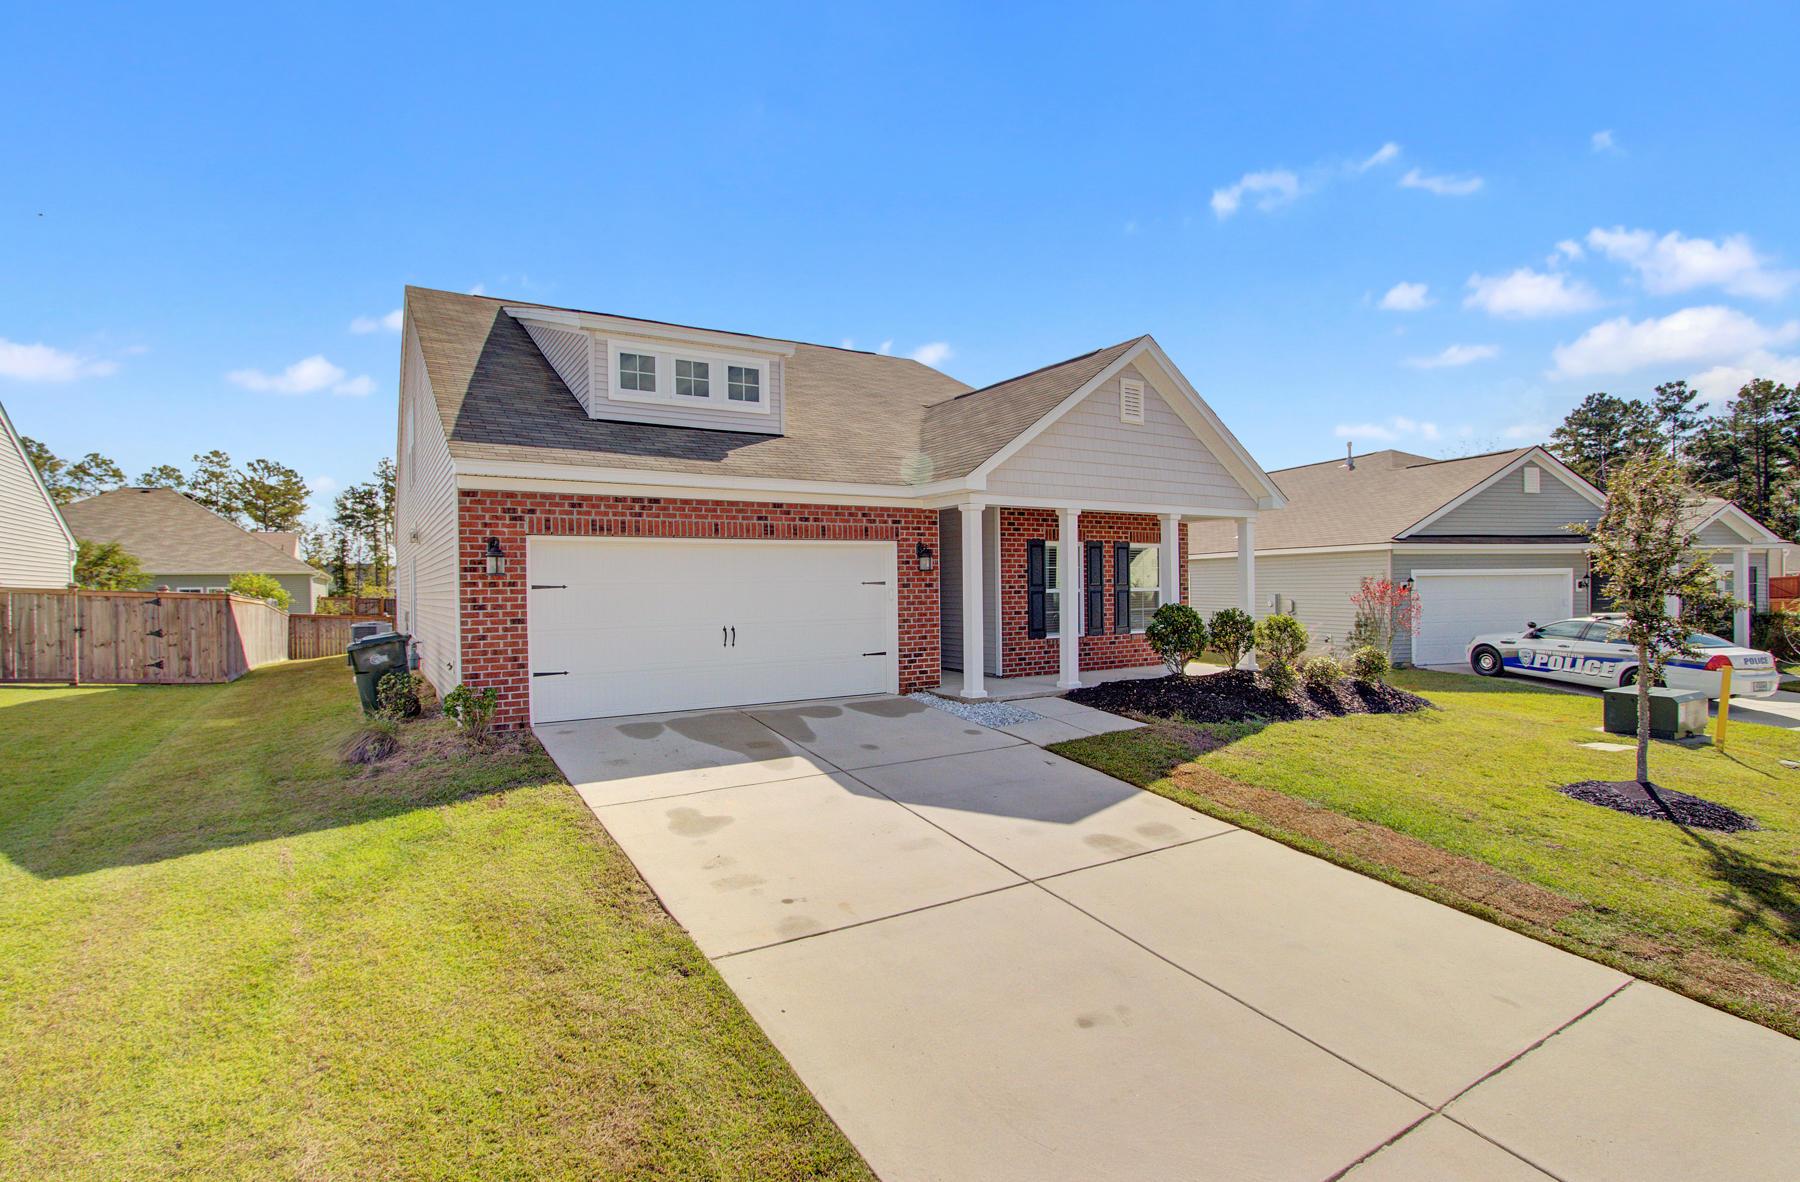 Brickhope Plantation Homes For Sale - 616 Zinnia, Goose Creek, SC - 15